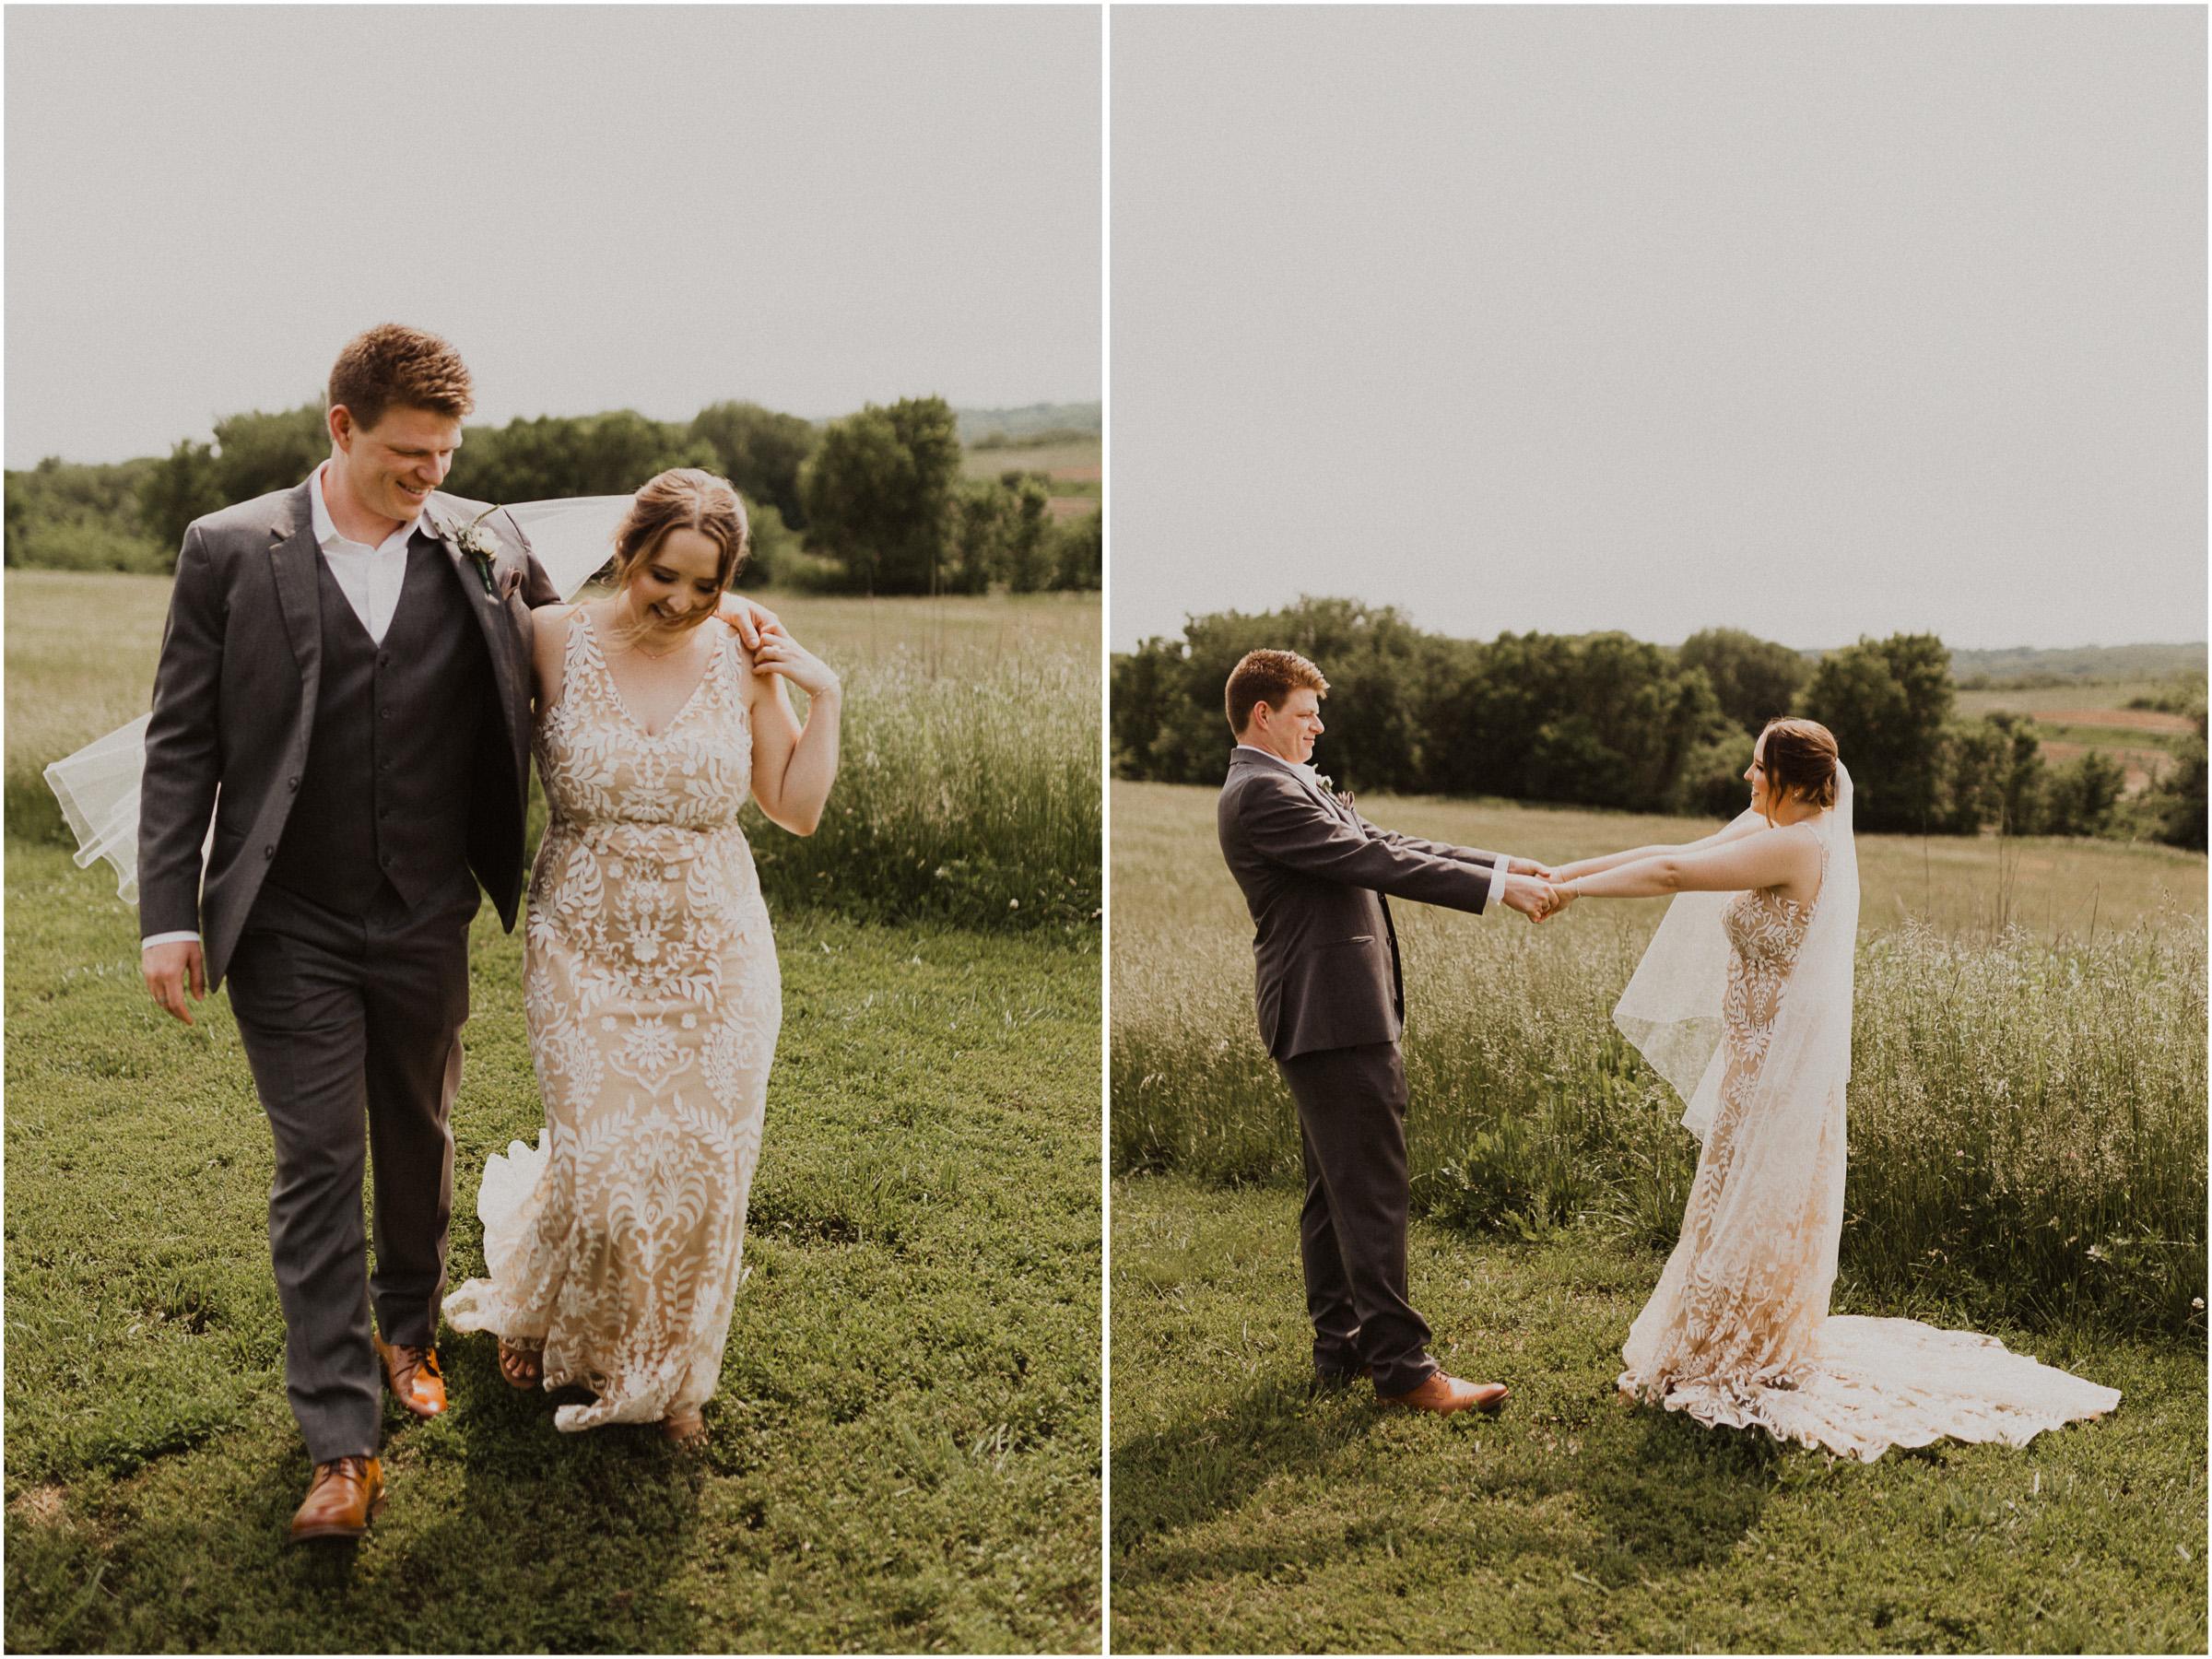 alyssa barletter photography weston red barn farm timberbarn summer outdoor wedding-38.jpg